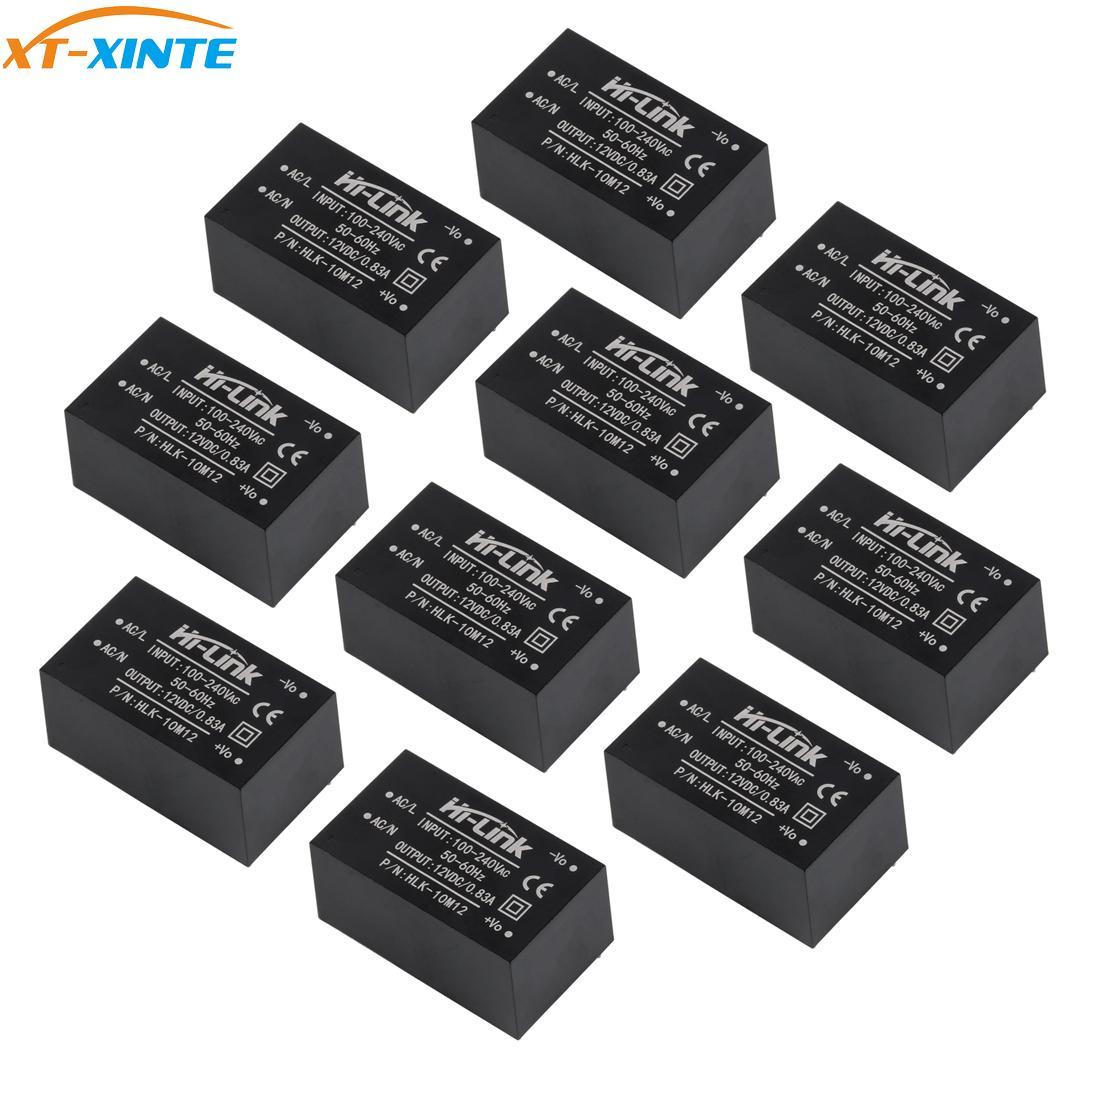 10pcs HLK-PM01 HLK-5M05 10M05 HLK-2M05 AC DC 220V To 5V/3.3V/12V Mini Power Supply Intelligent Household Switch Power Module